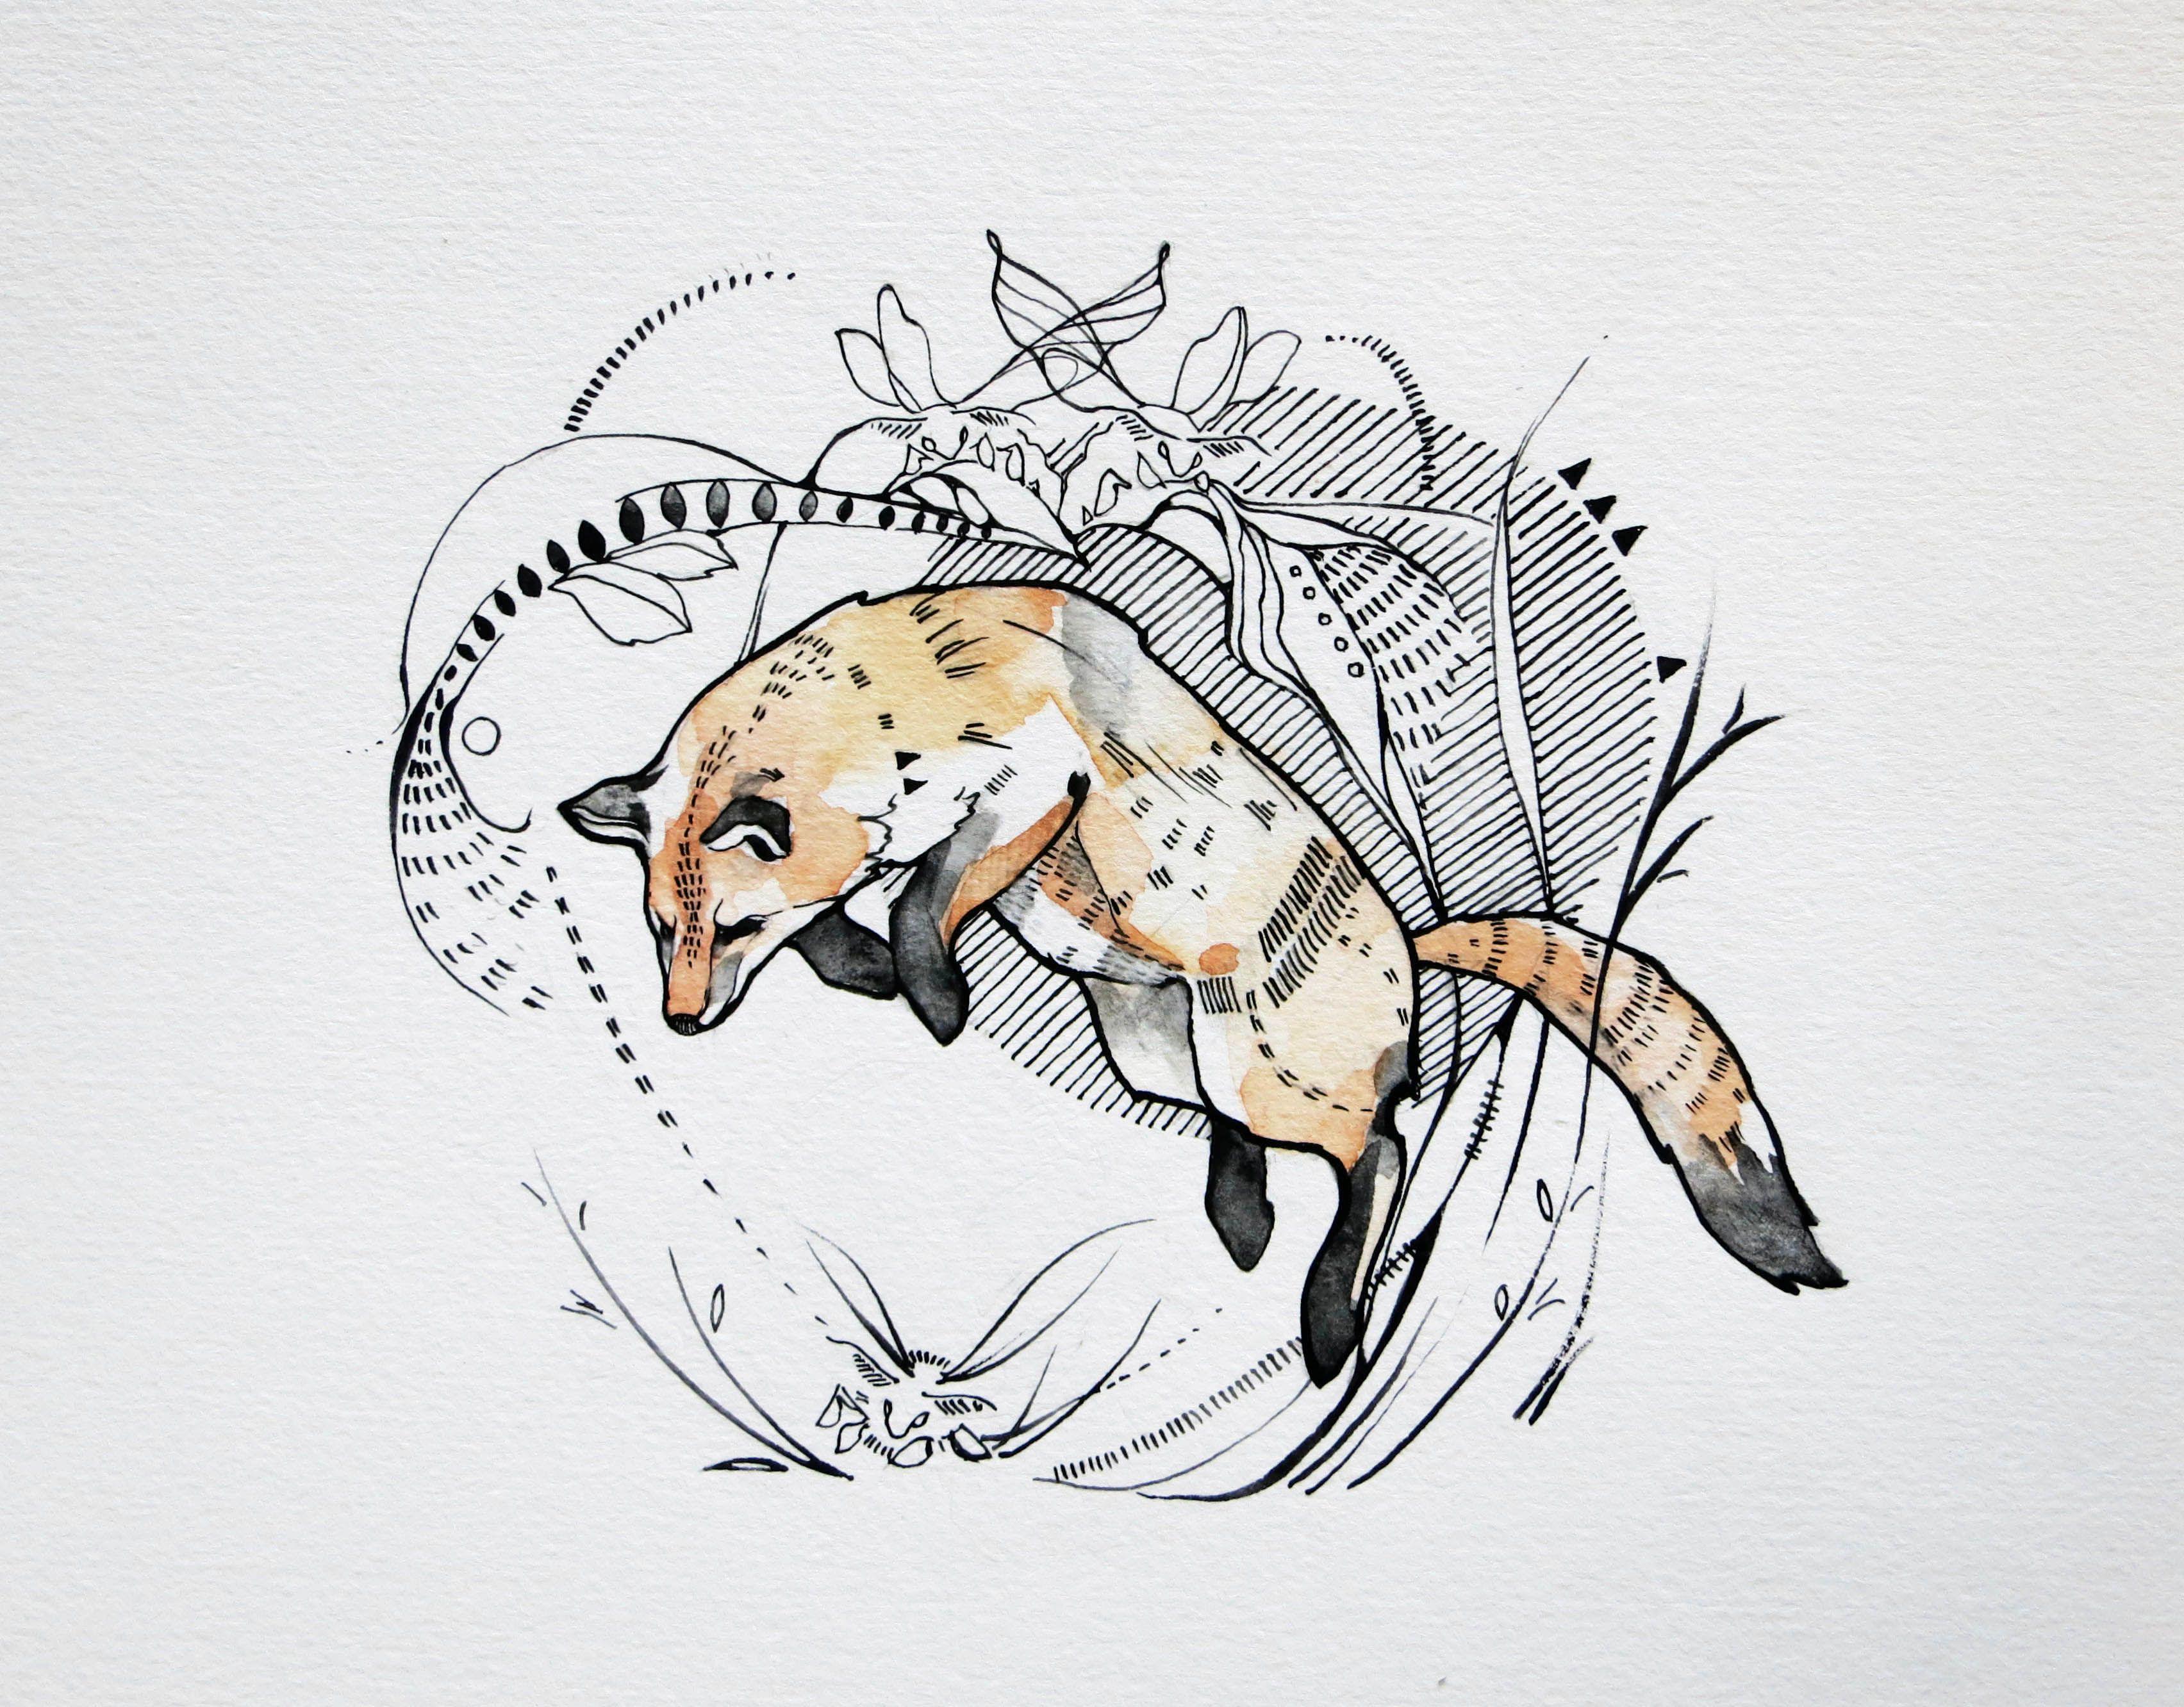 Картинка волка и лисы линиями